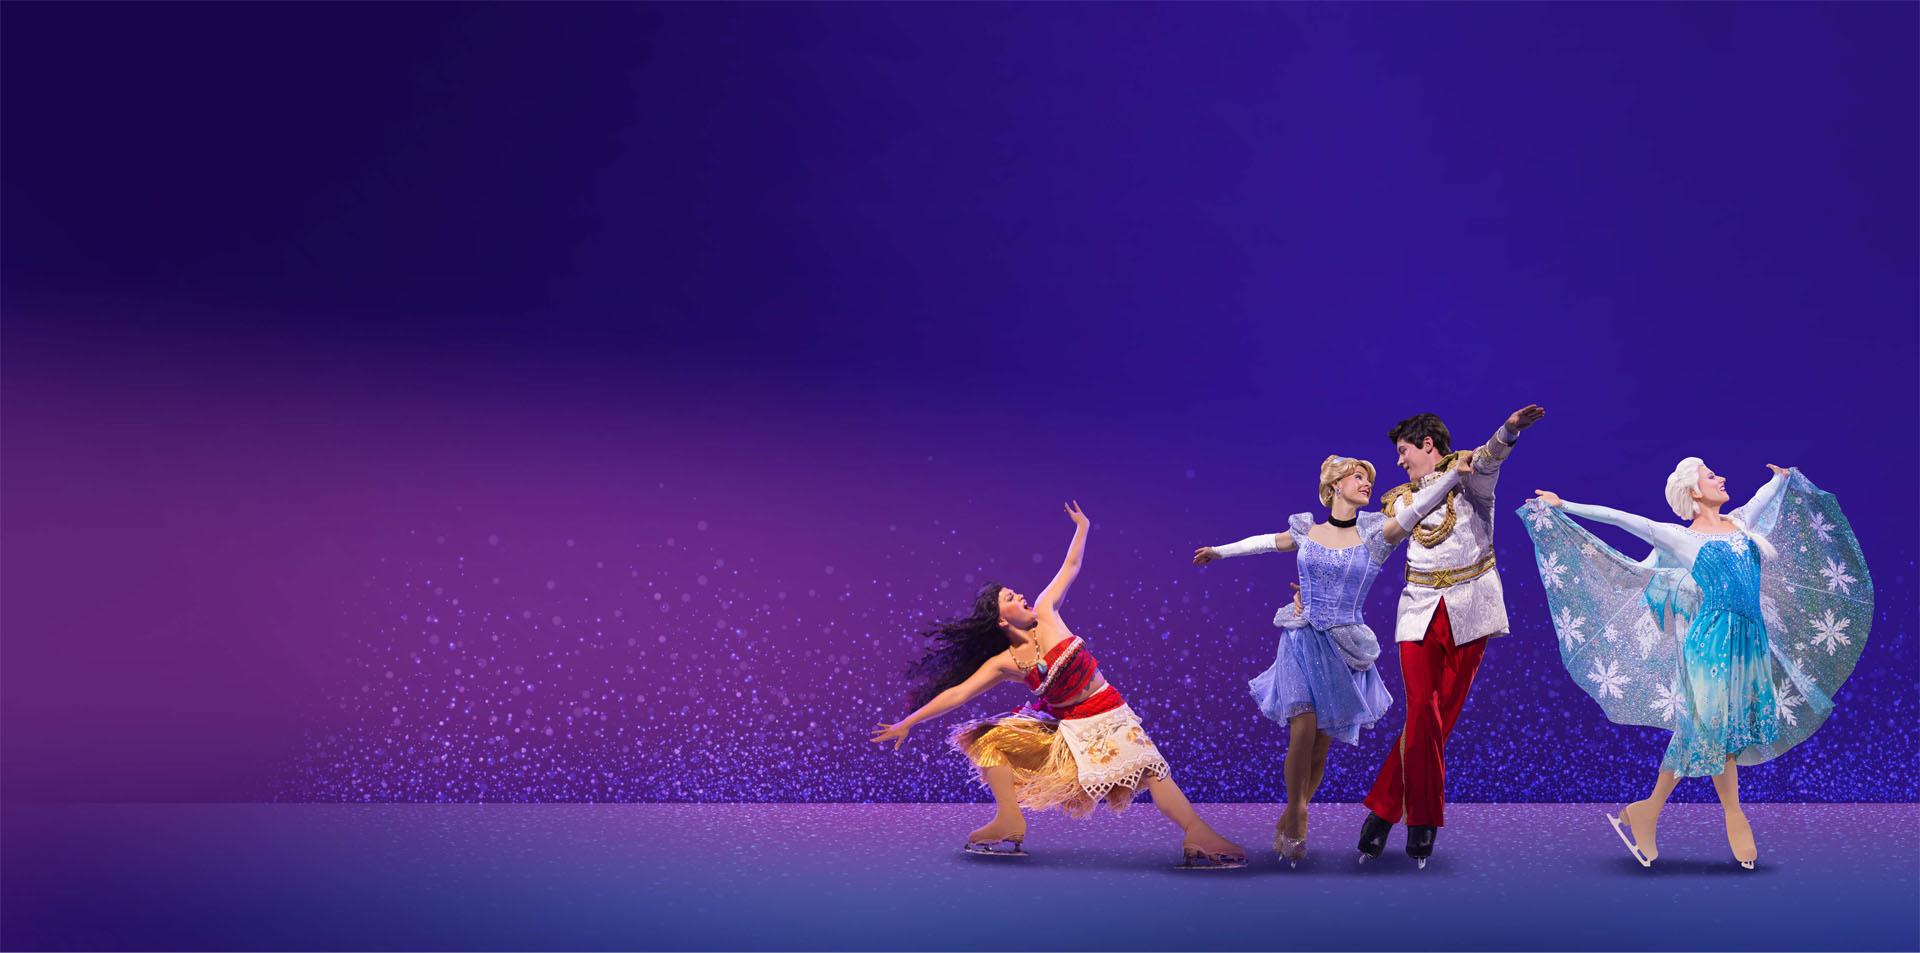 Queen elsa and friends dancing on ice